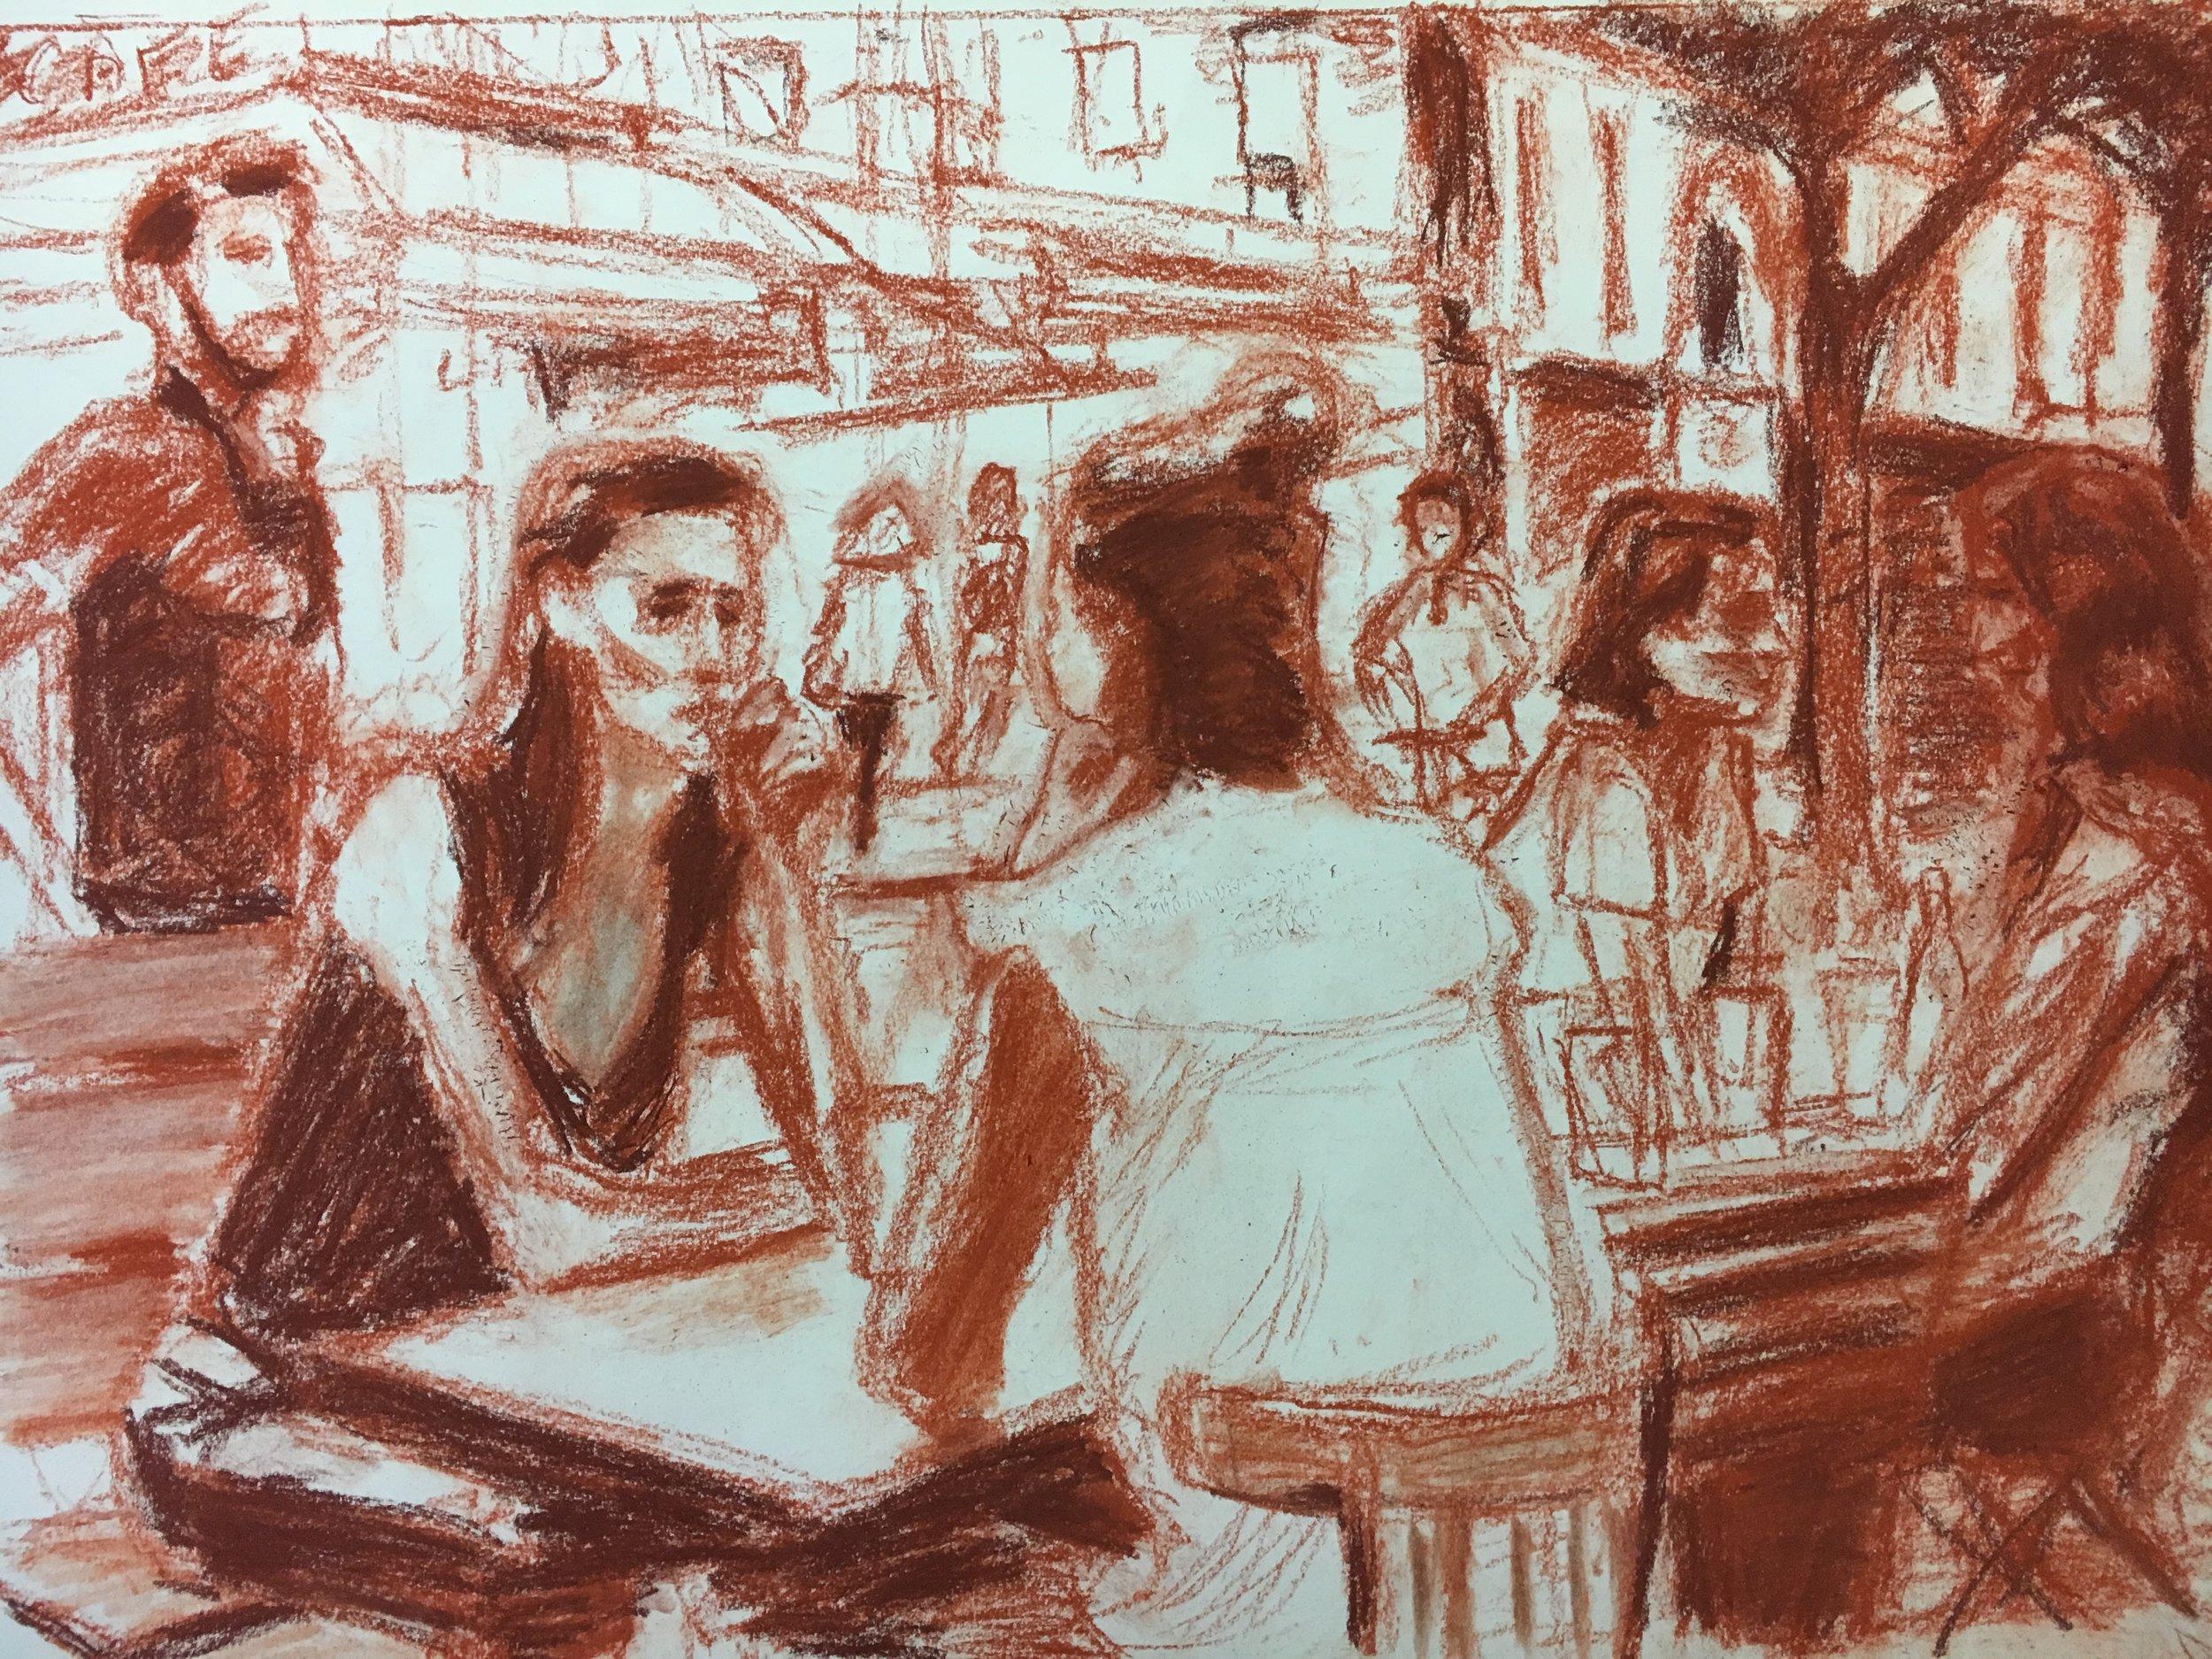 Cafe life on Rue Montmartre